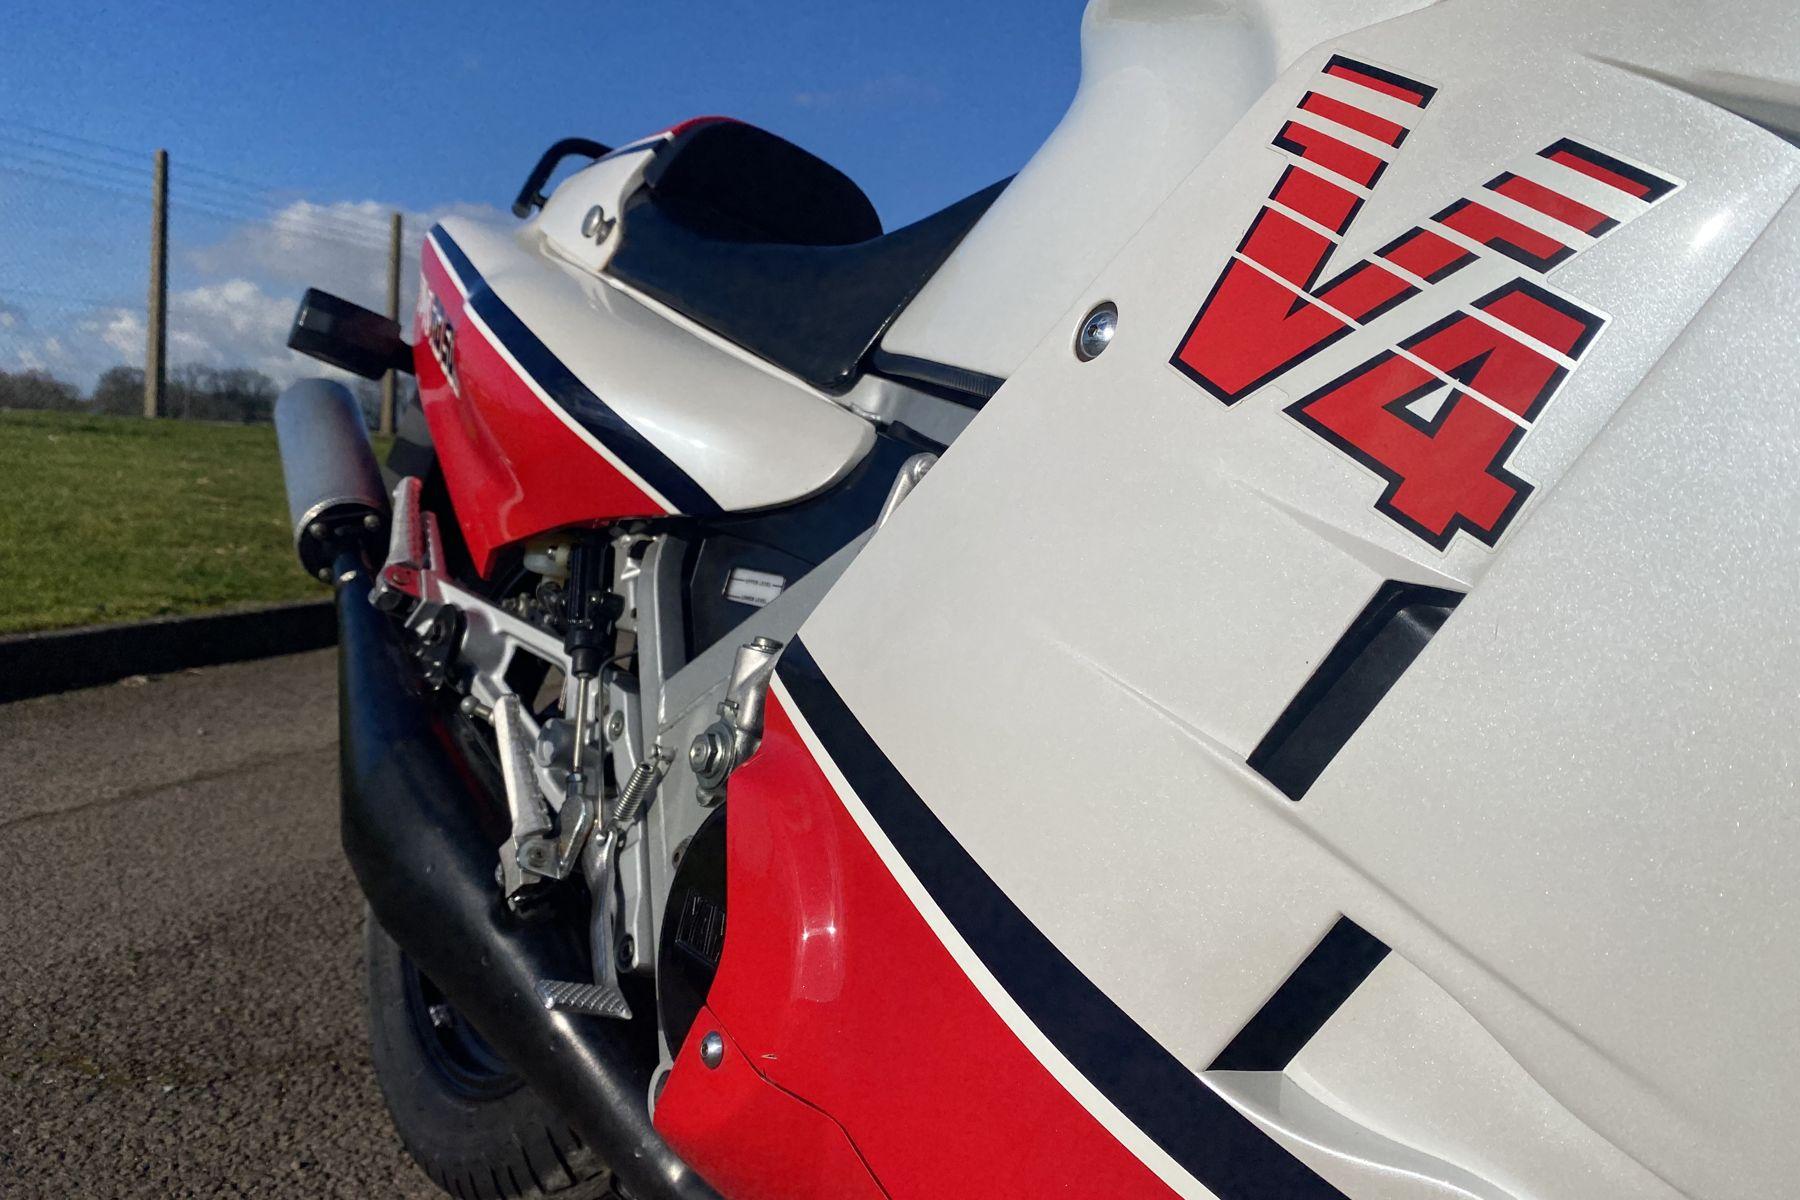 Image may contain motorcycle, racing memorabilia, vehicle performance parts